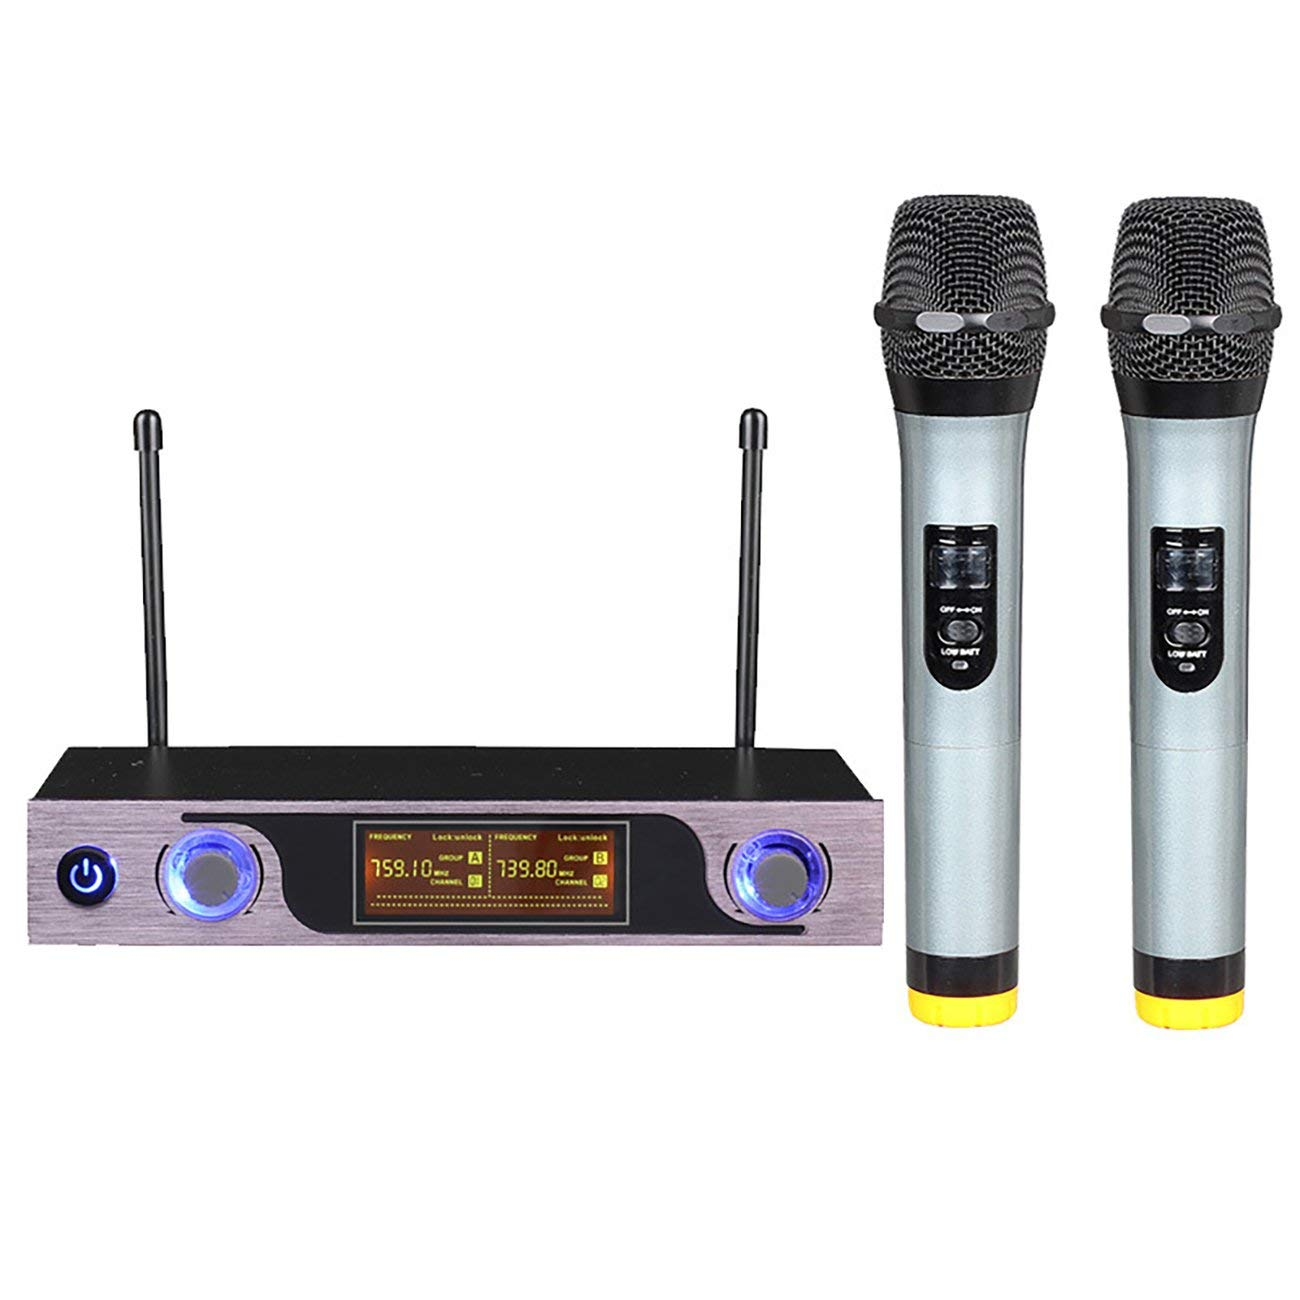 Socialism Professionelles Dual-Funkmikrofonsystem Bühnenauftritte Funkmikrofon Dynamisches Handheld-Funkmikrofon